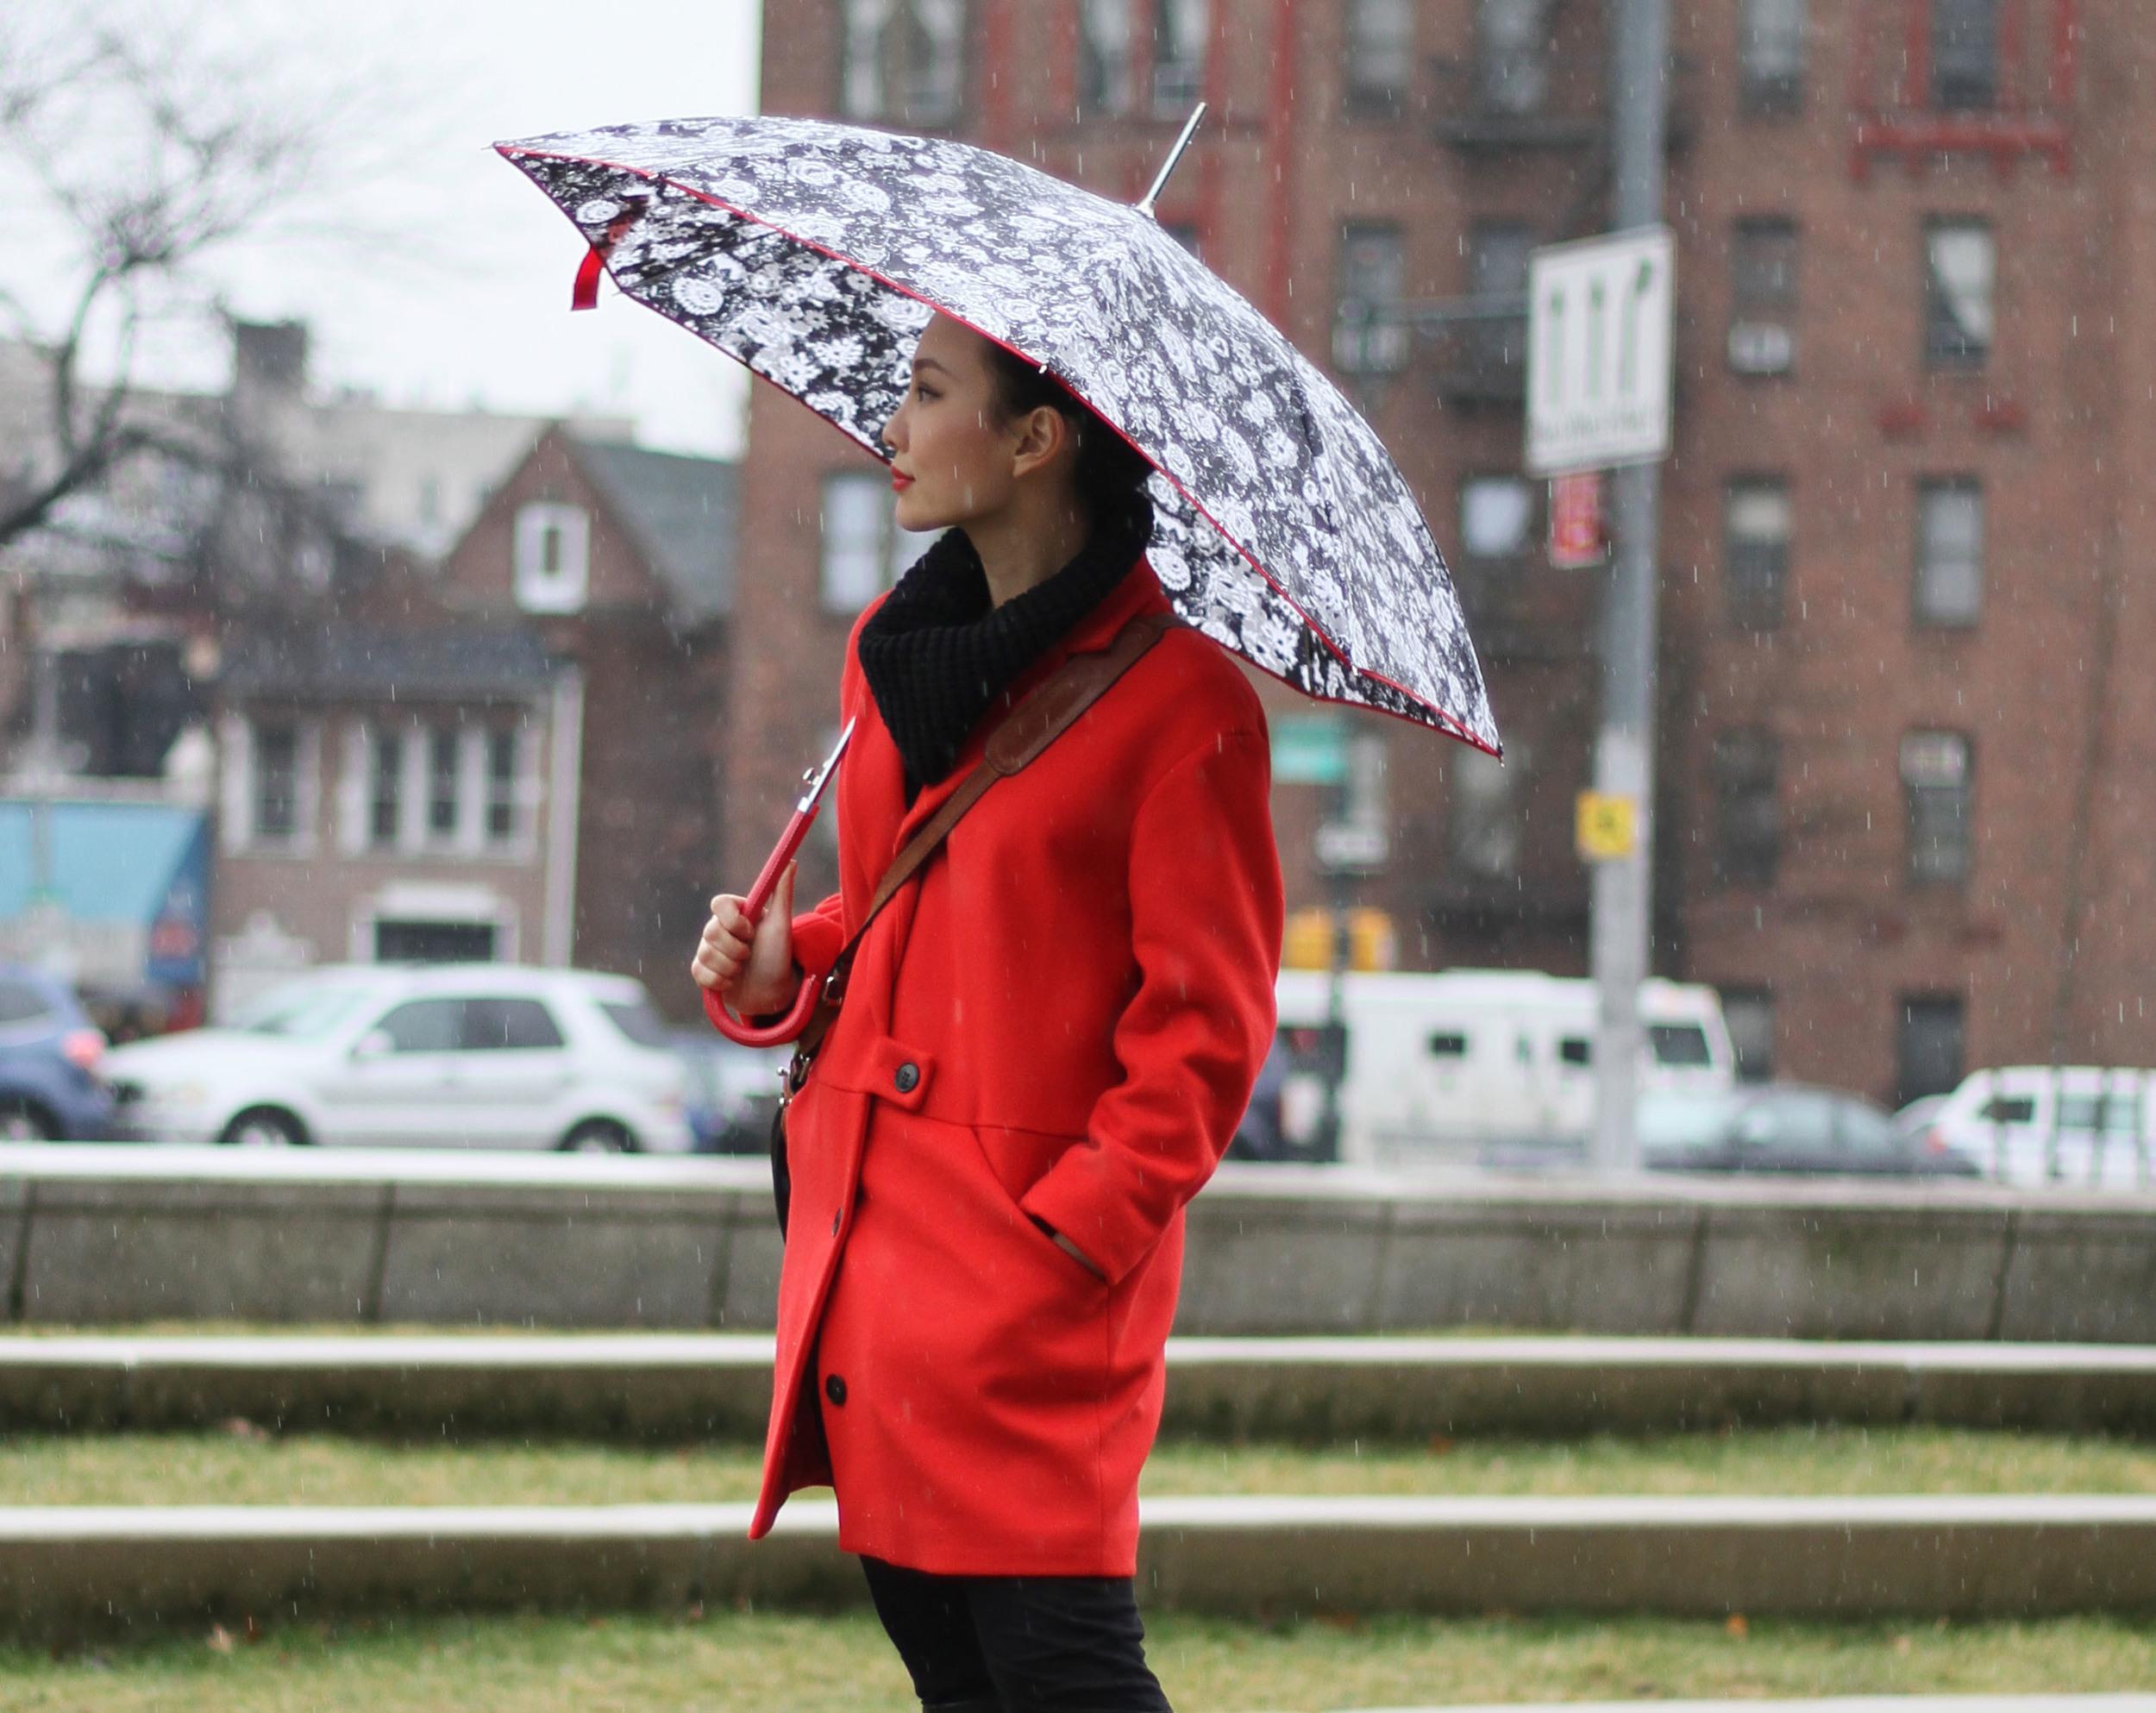 winter fashion photography.jpg